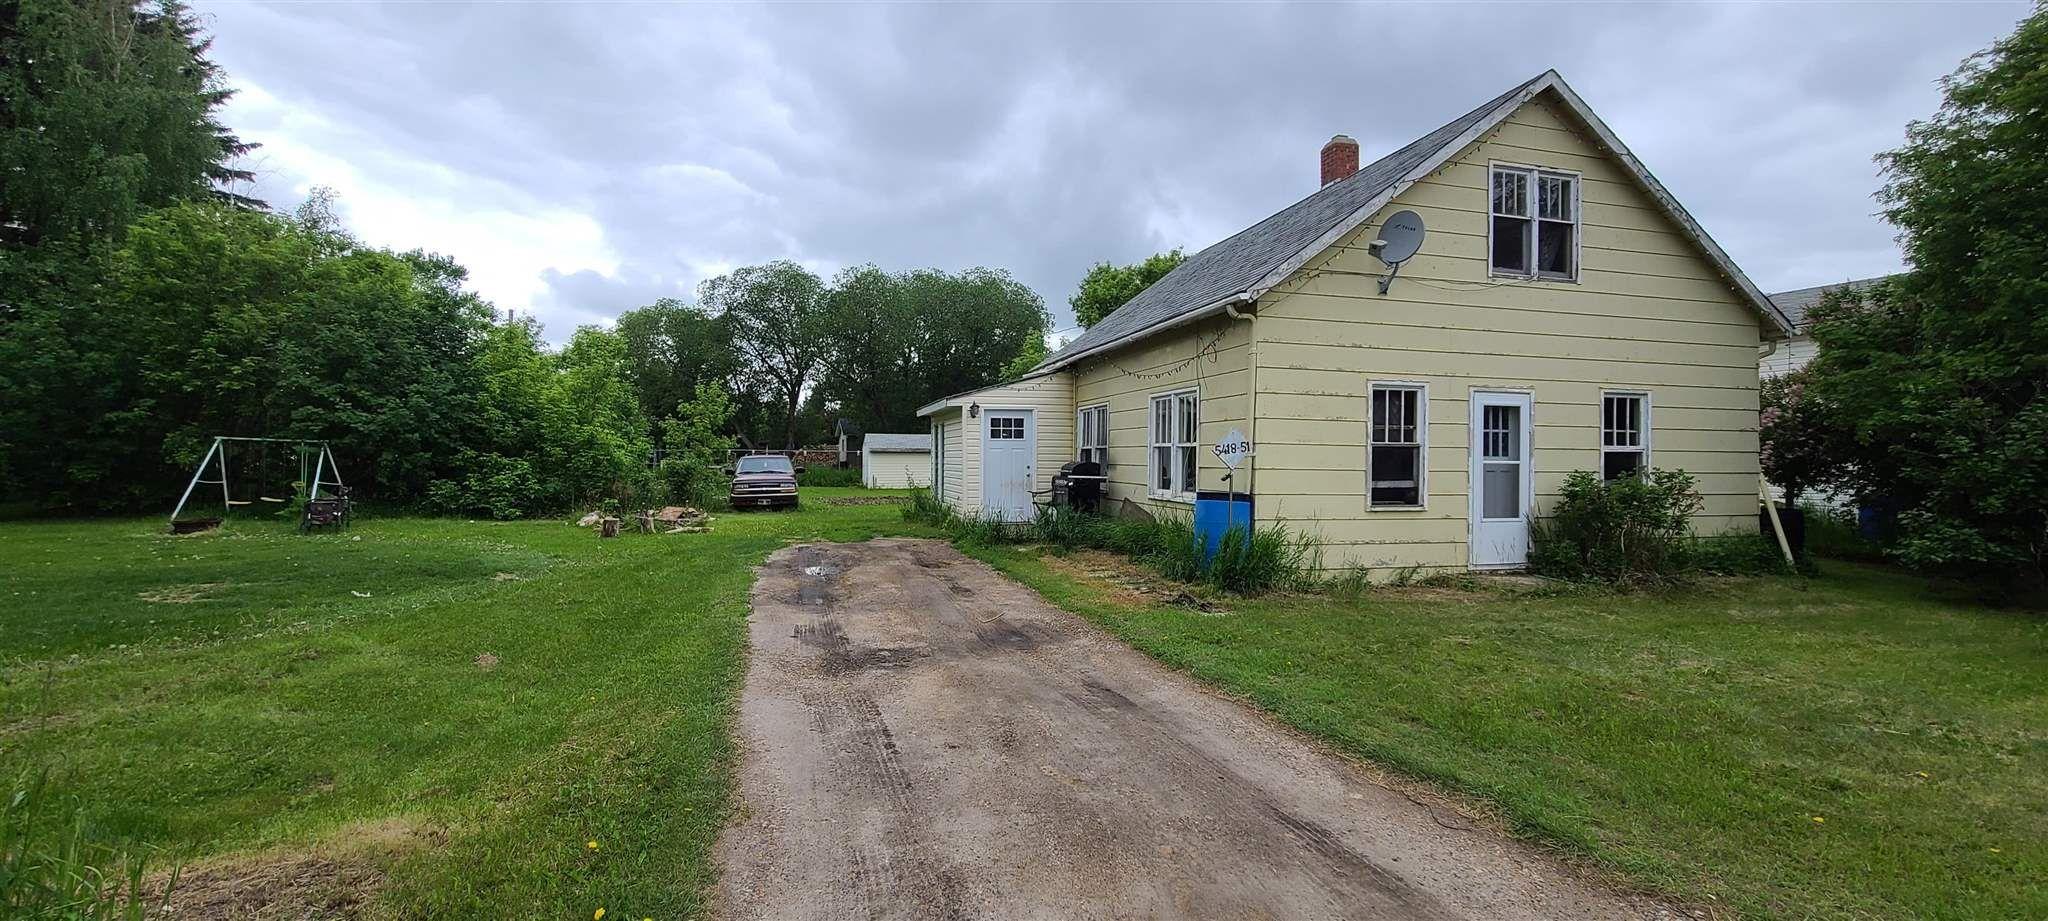 Main Photo: 5418 51 Street: St. Paul Town House for sale : MLS®# E4231294